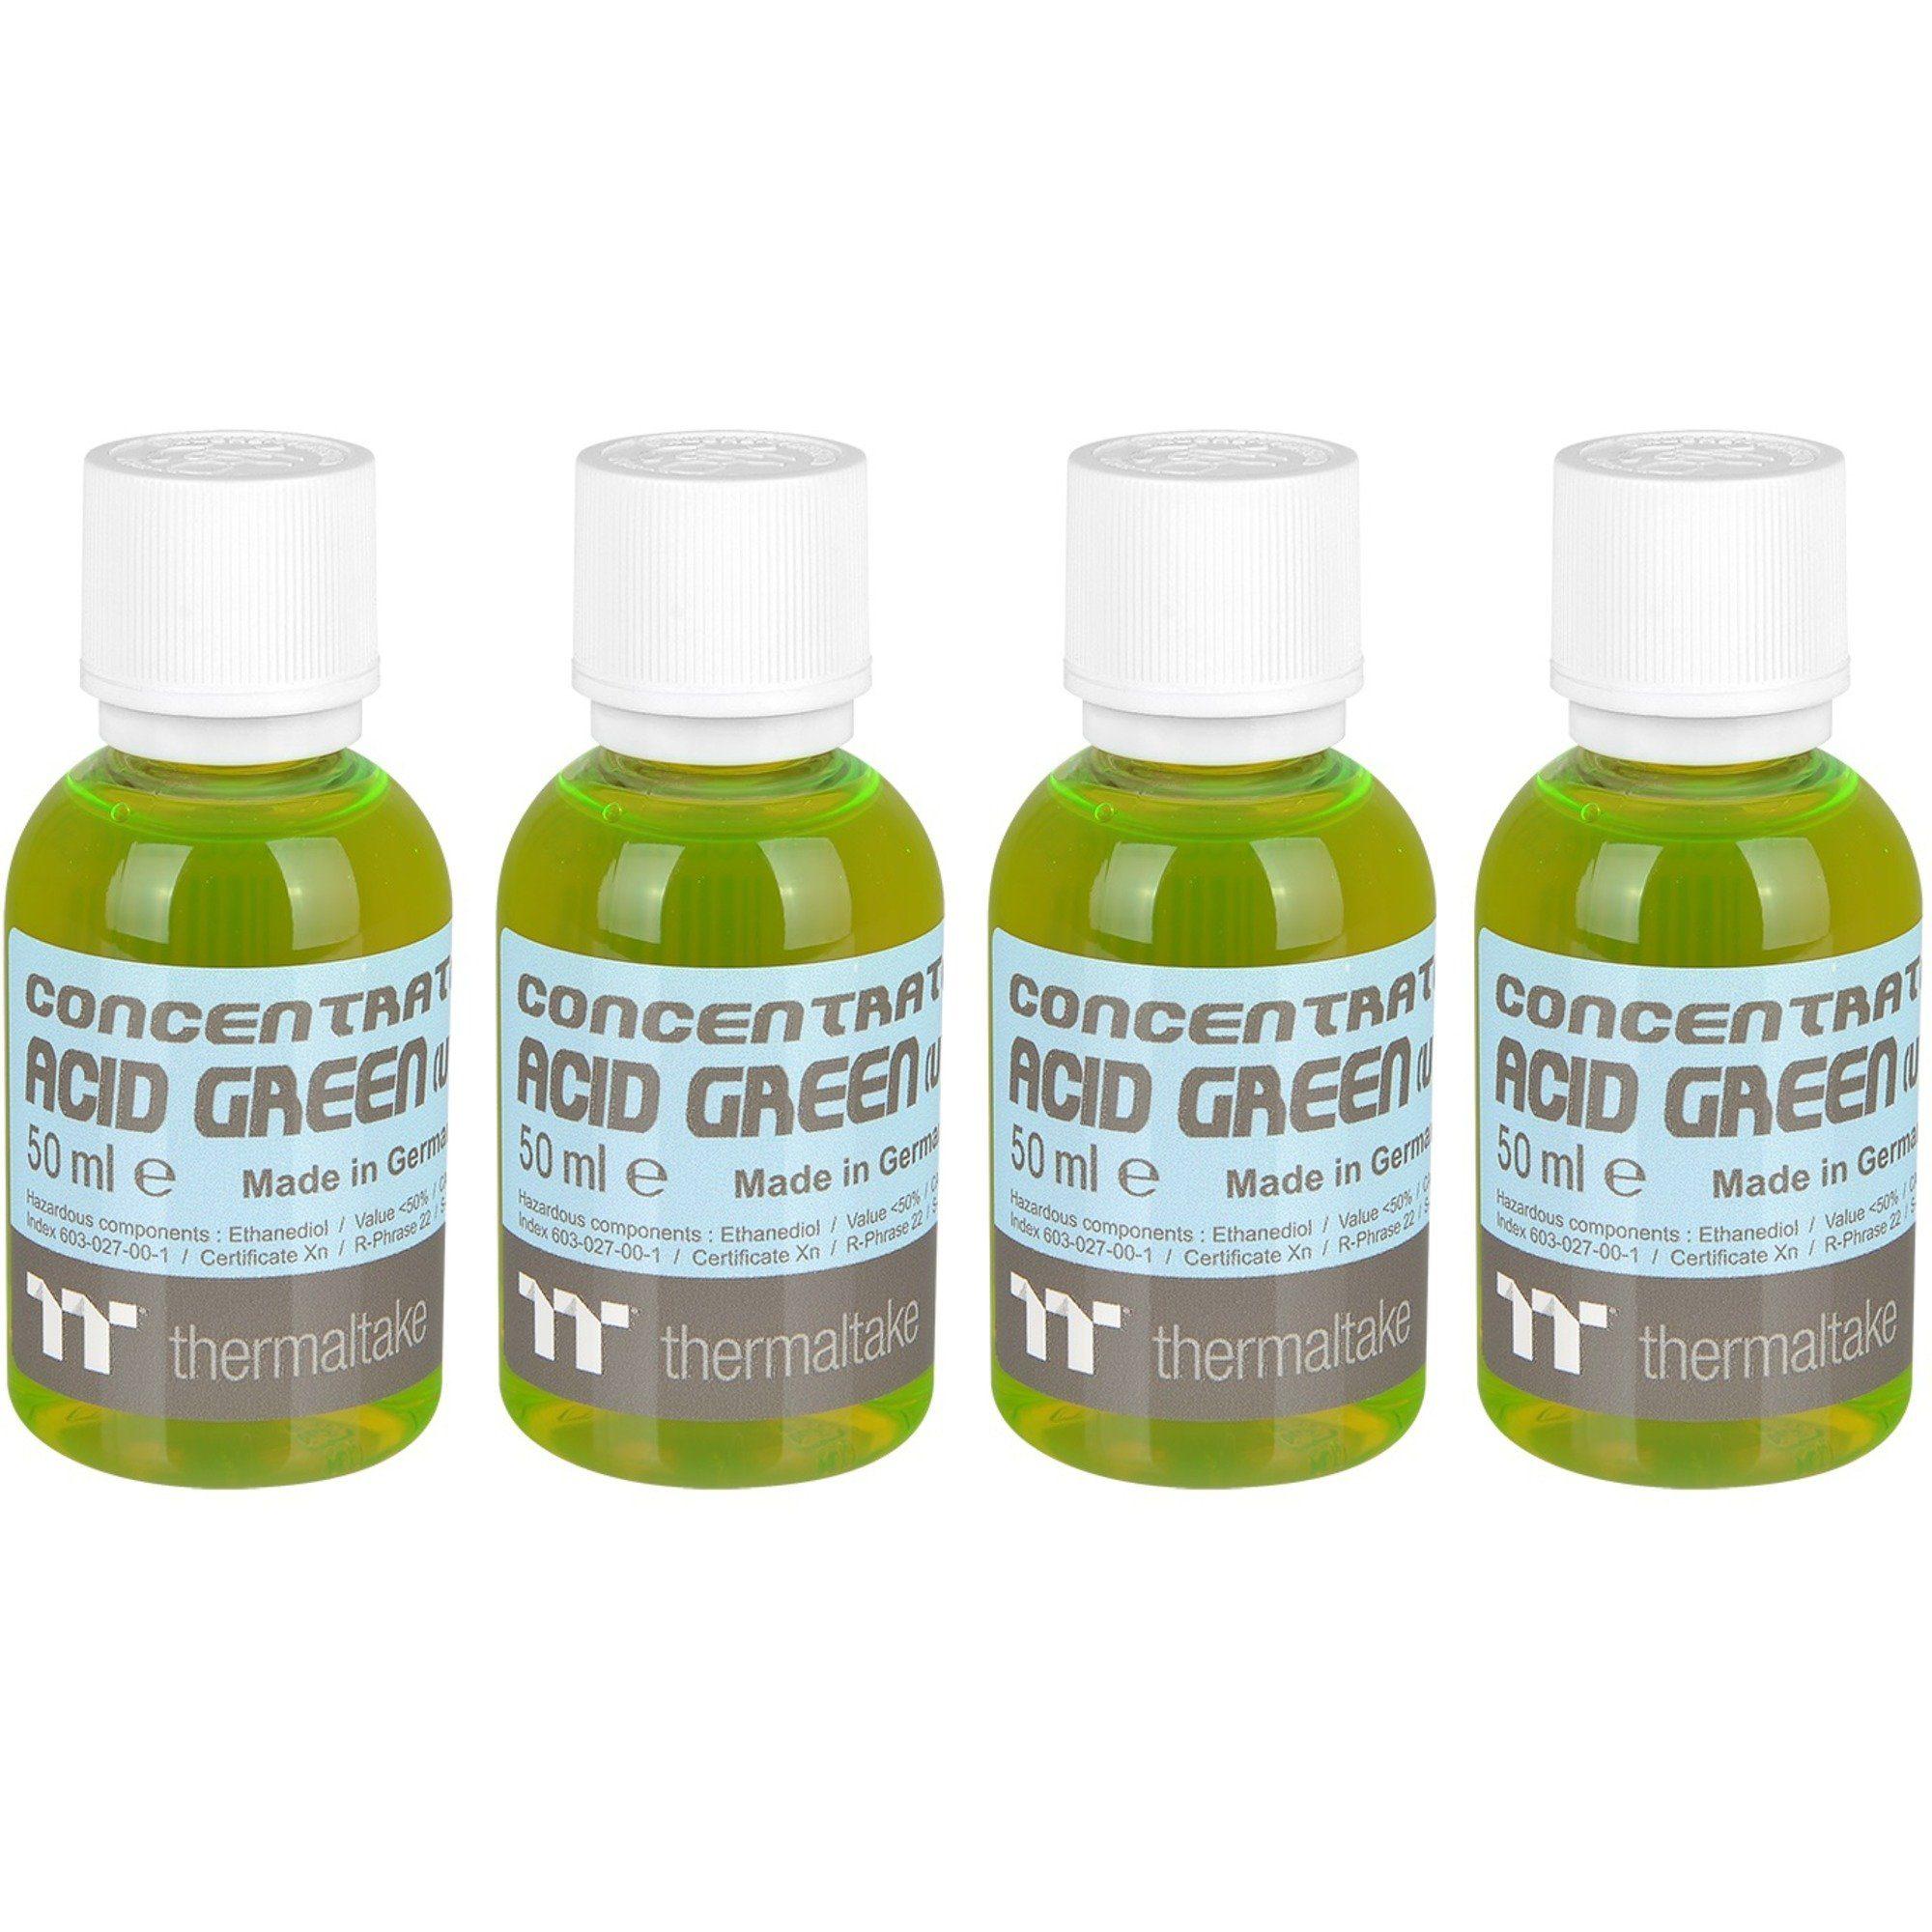 Thermaltake Kühlmittel »Premium Concentrate - Acid Green (4 Bottle Pack)«